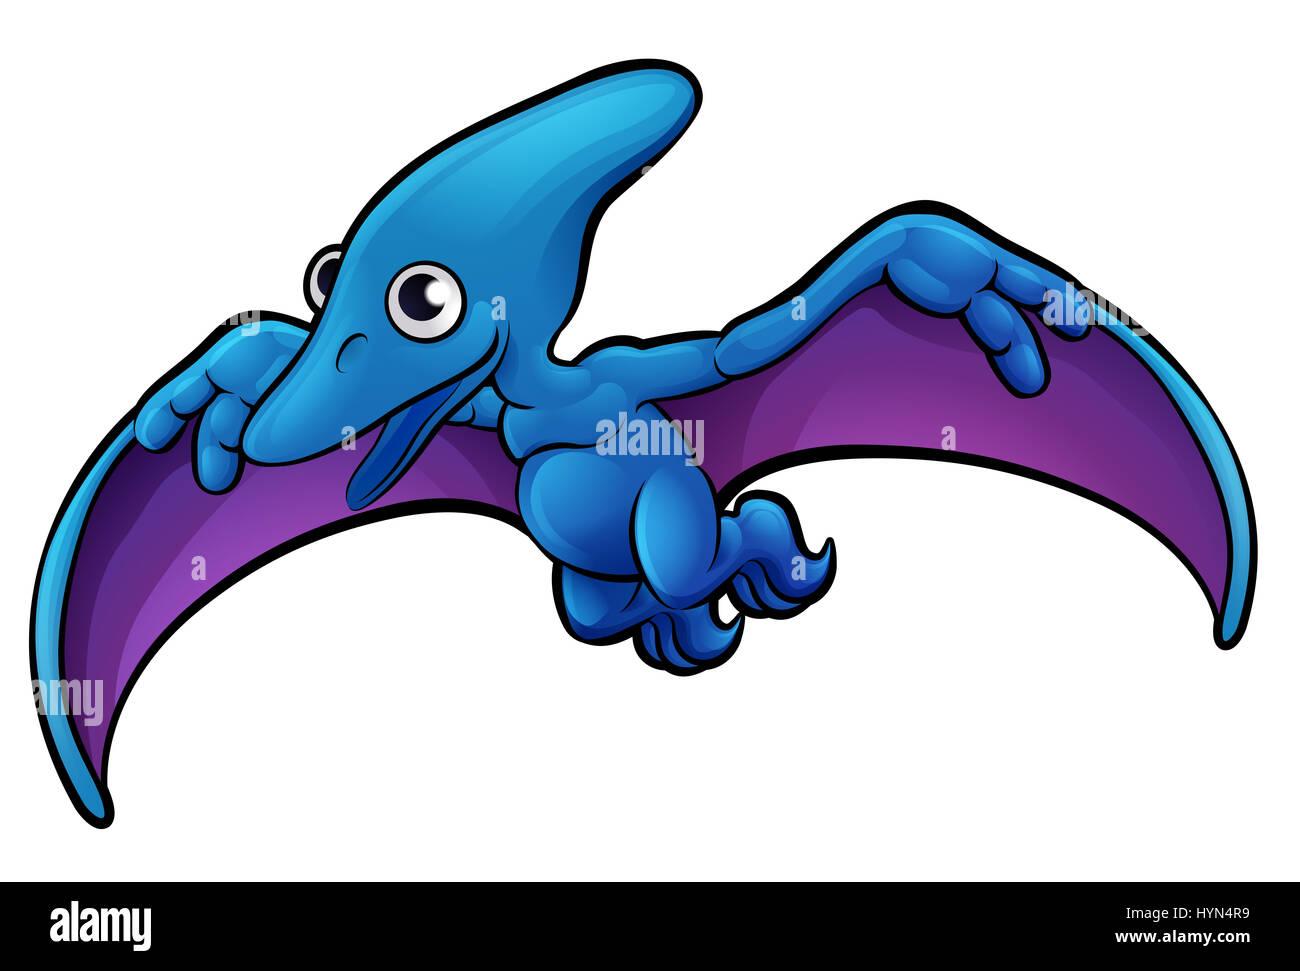 a pterodactyl dinosaur animals cartoon character stock